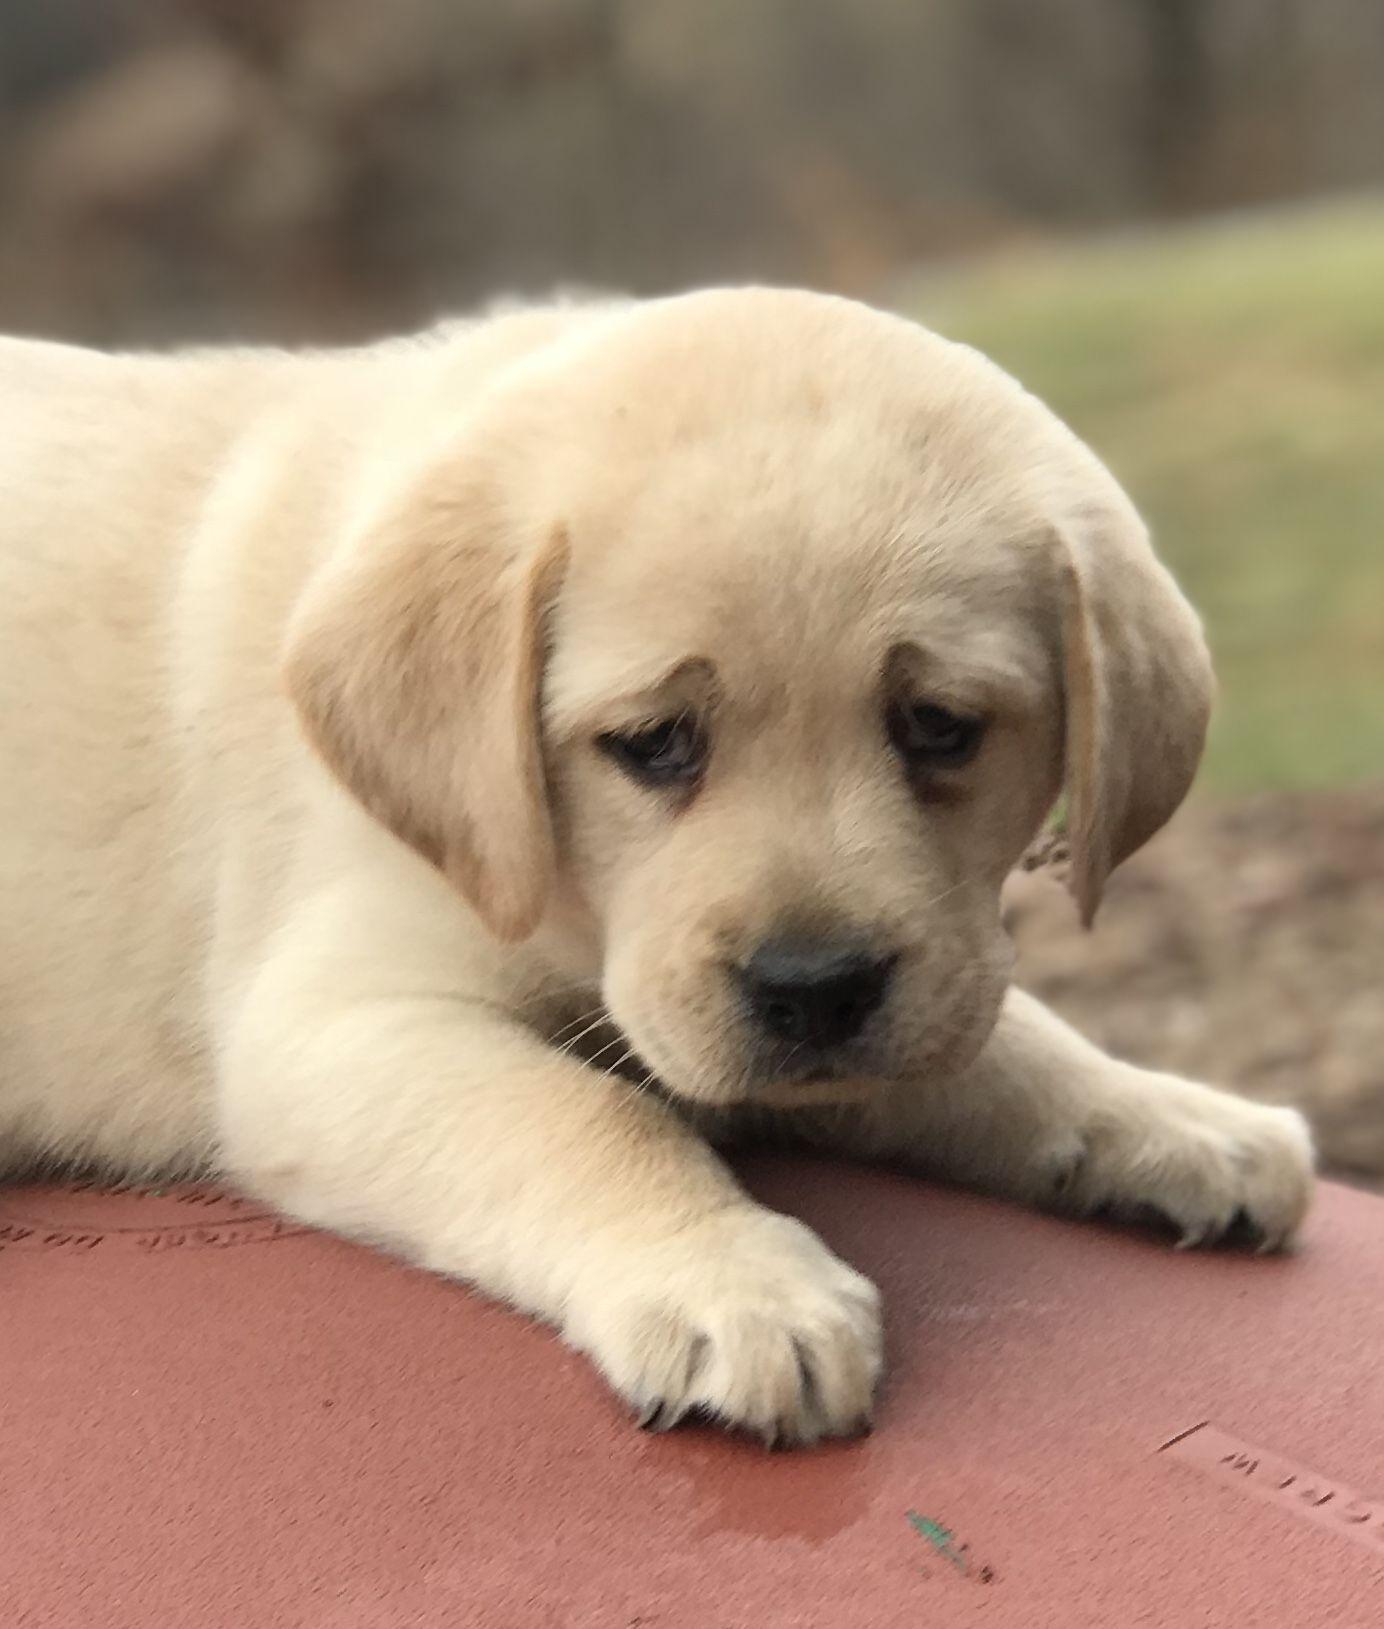 Buster A Male Akc Labrador Retriever Puppy For Sale In Mansfield Missouri Find Cute Labrador Retriev Labrador Retriever Labrador Retriever Puppies Labrador